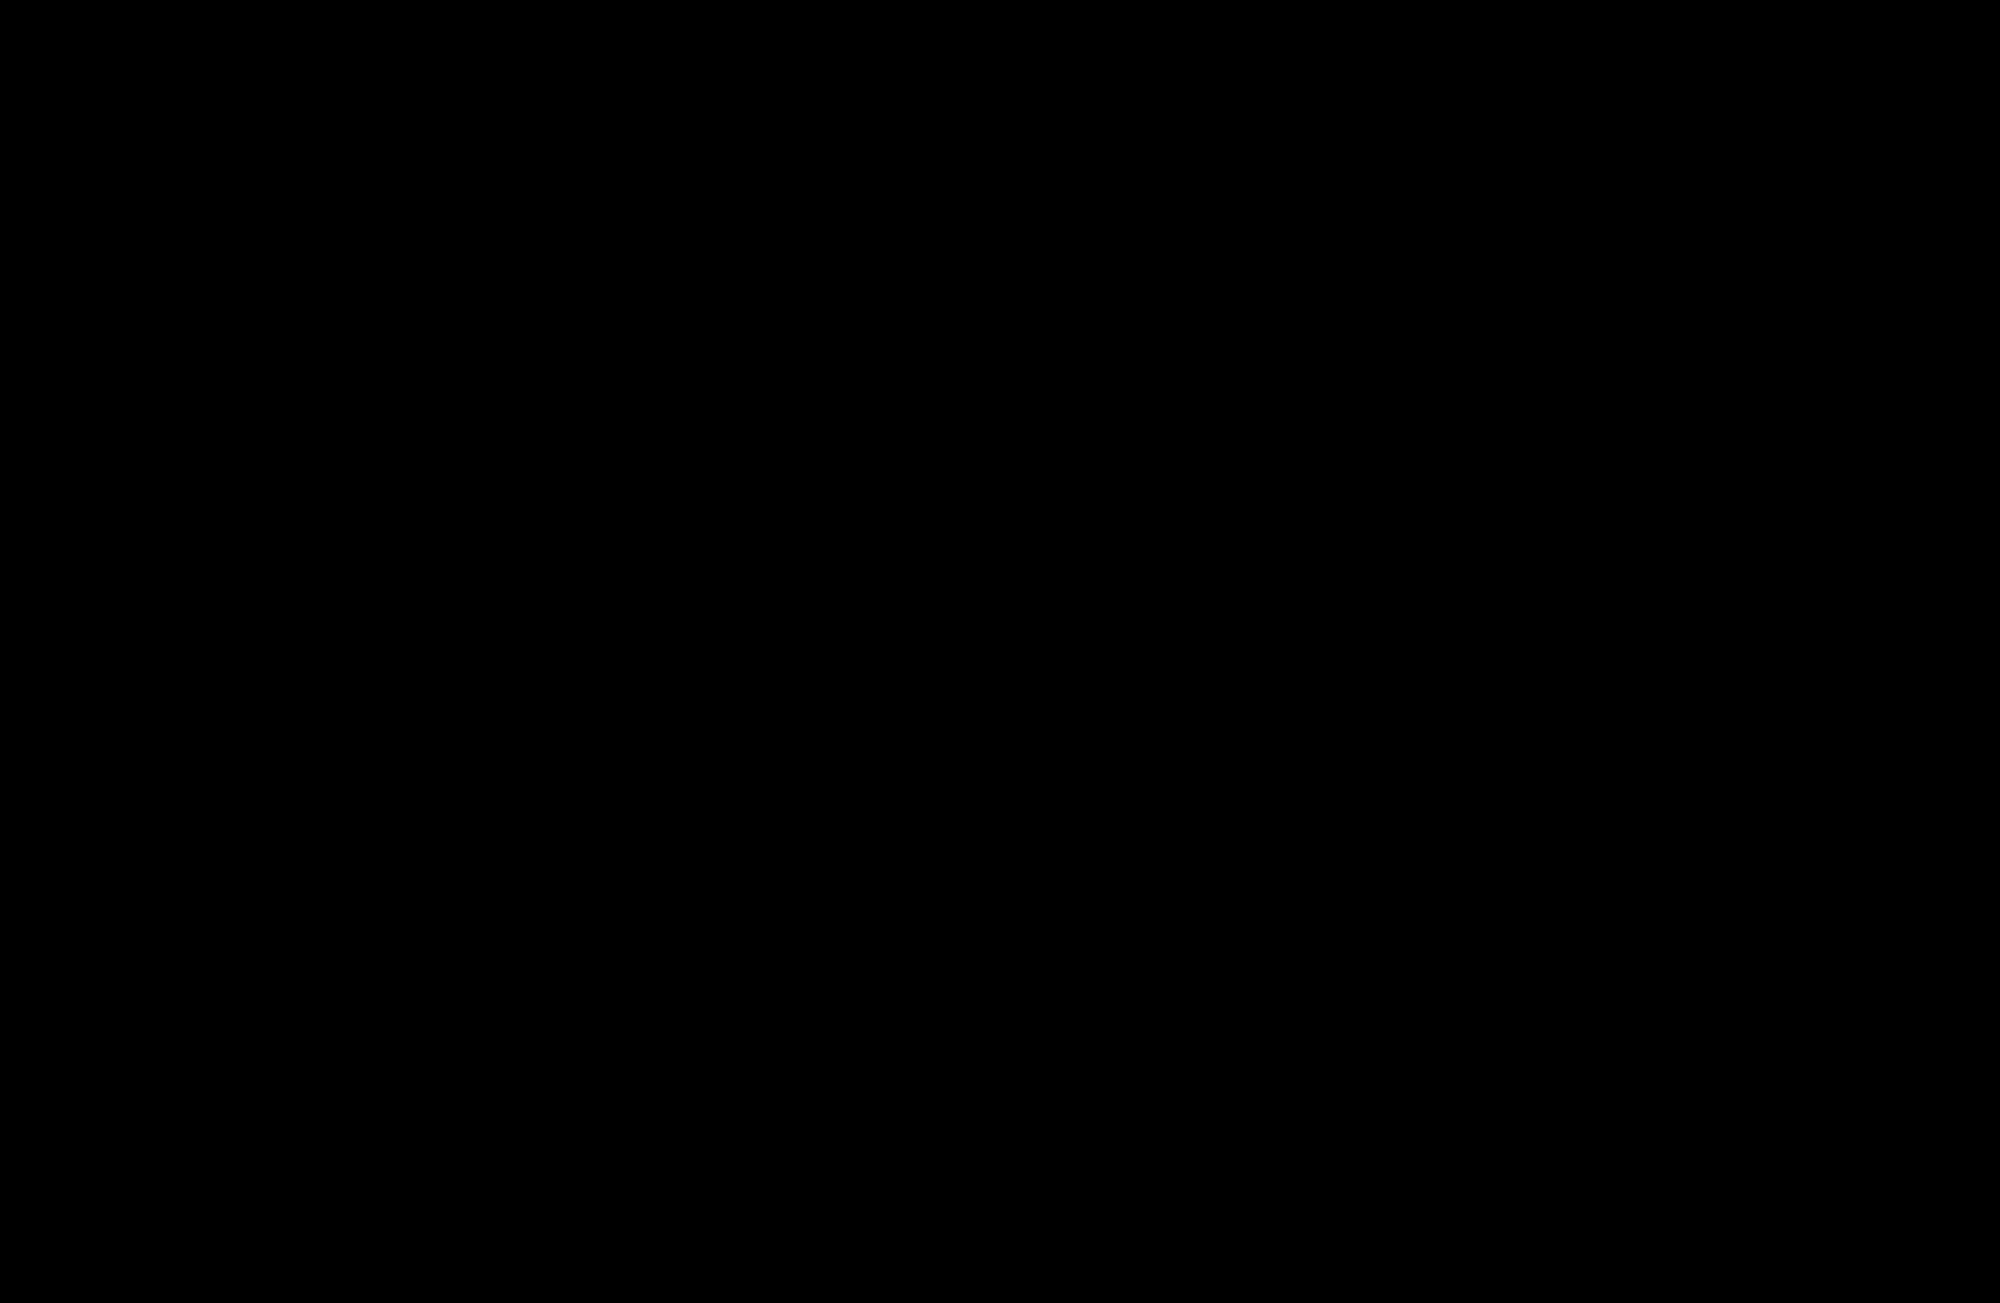 vergadering-logo-black.png